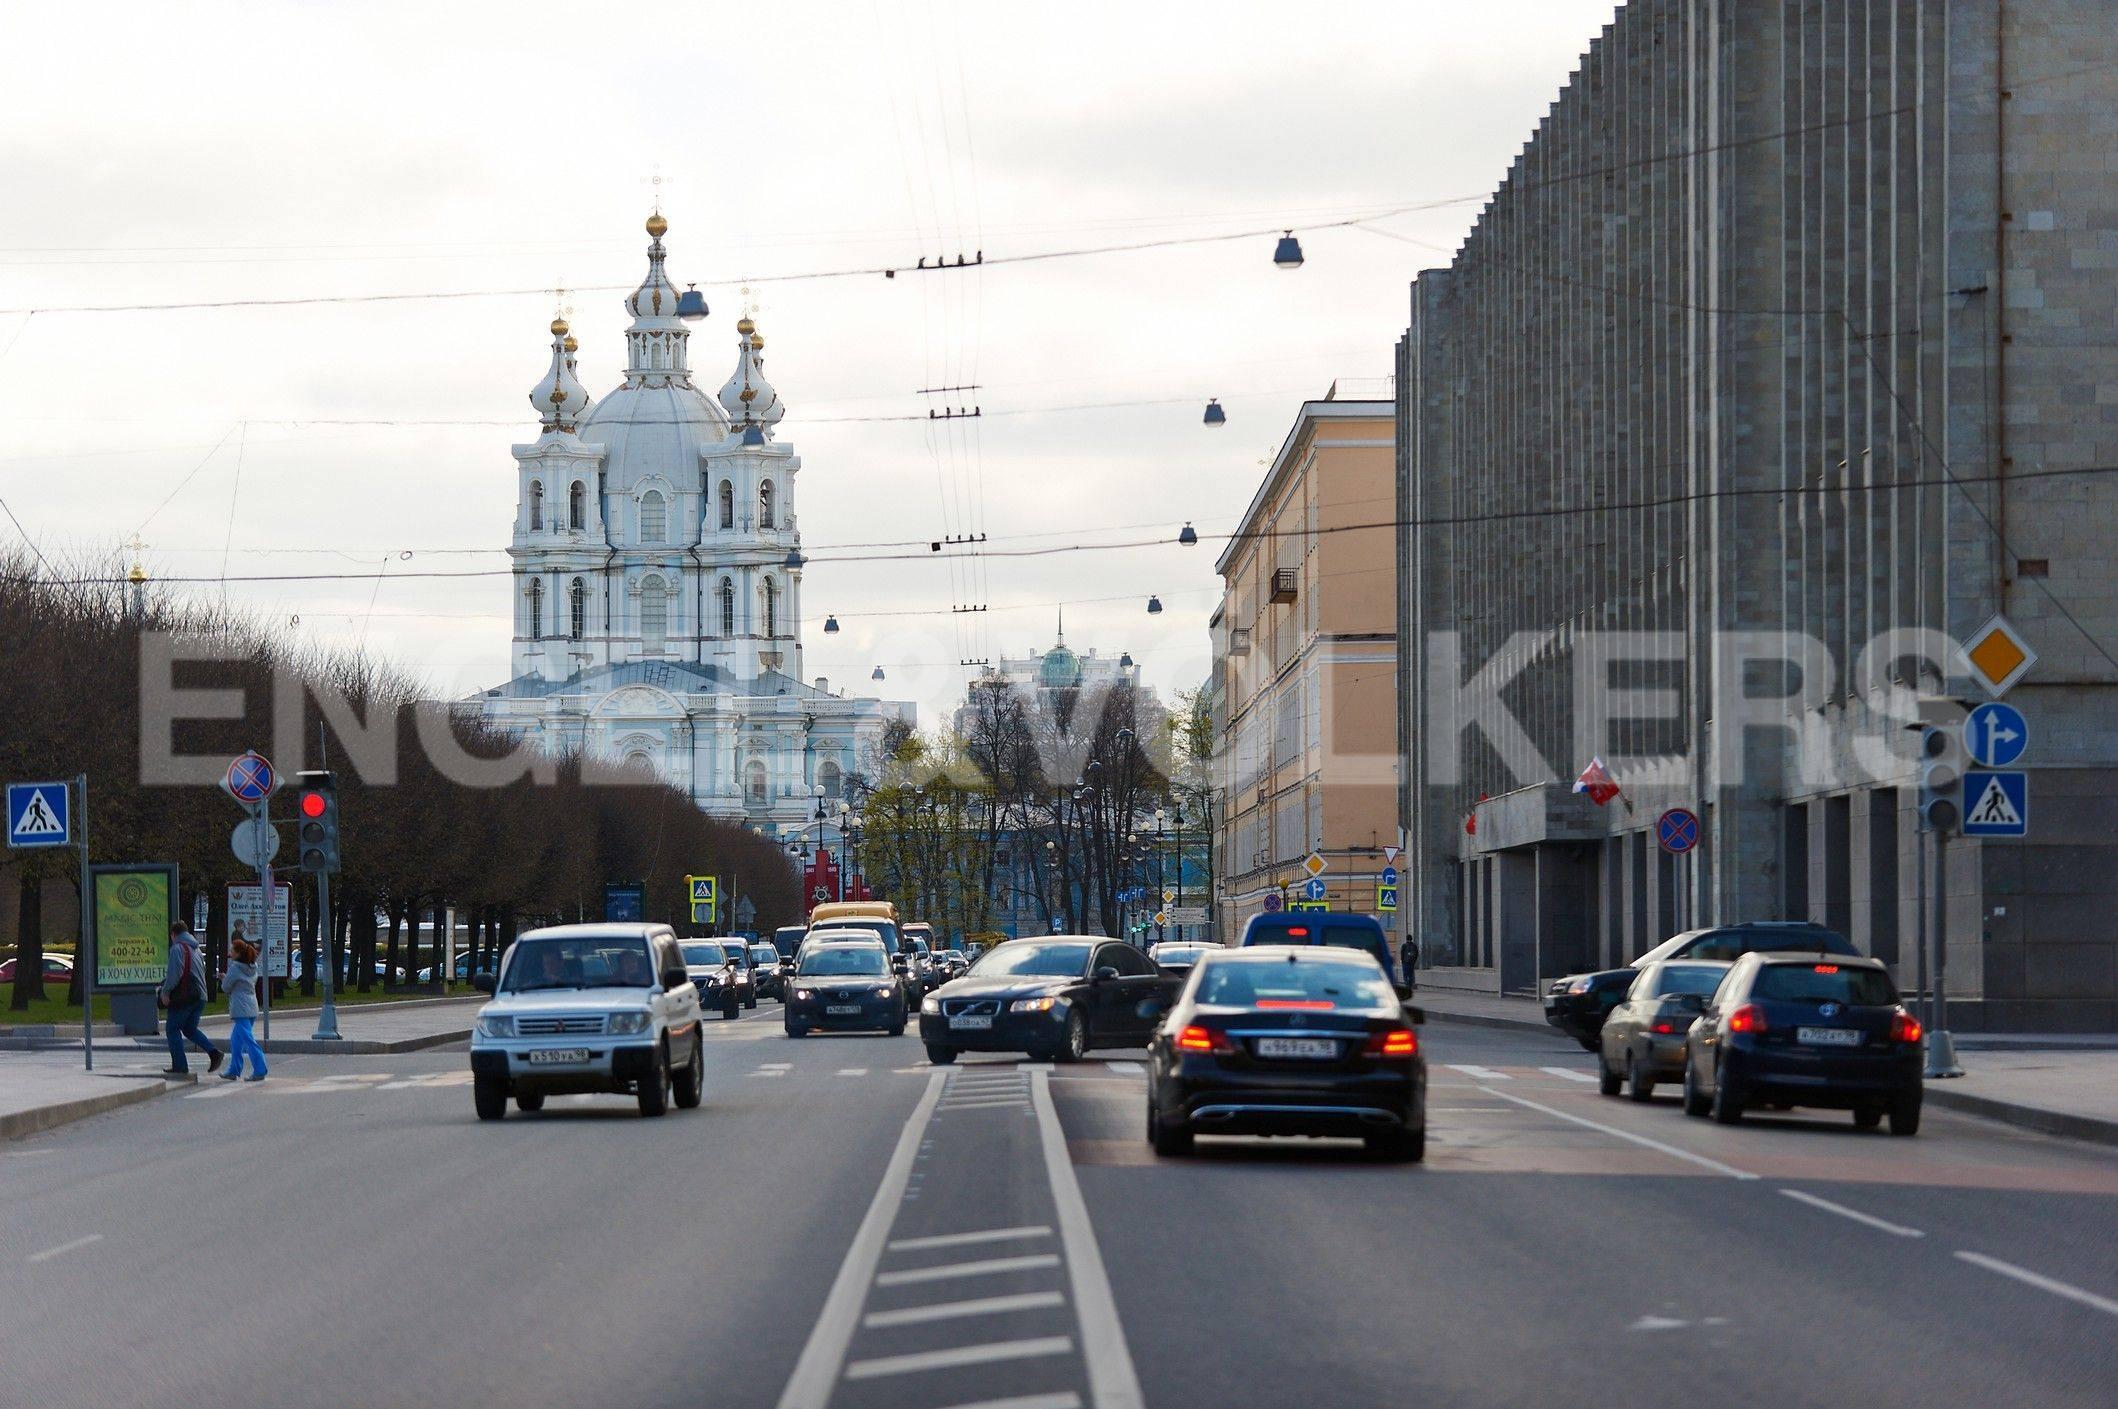 Элитные квартиры в Центральном районе. Санкт-Петербург, Шпалерная ул. 60. улица Шпалерная